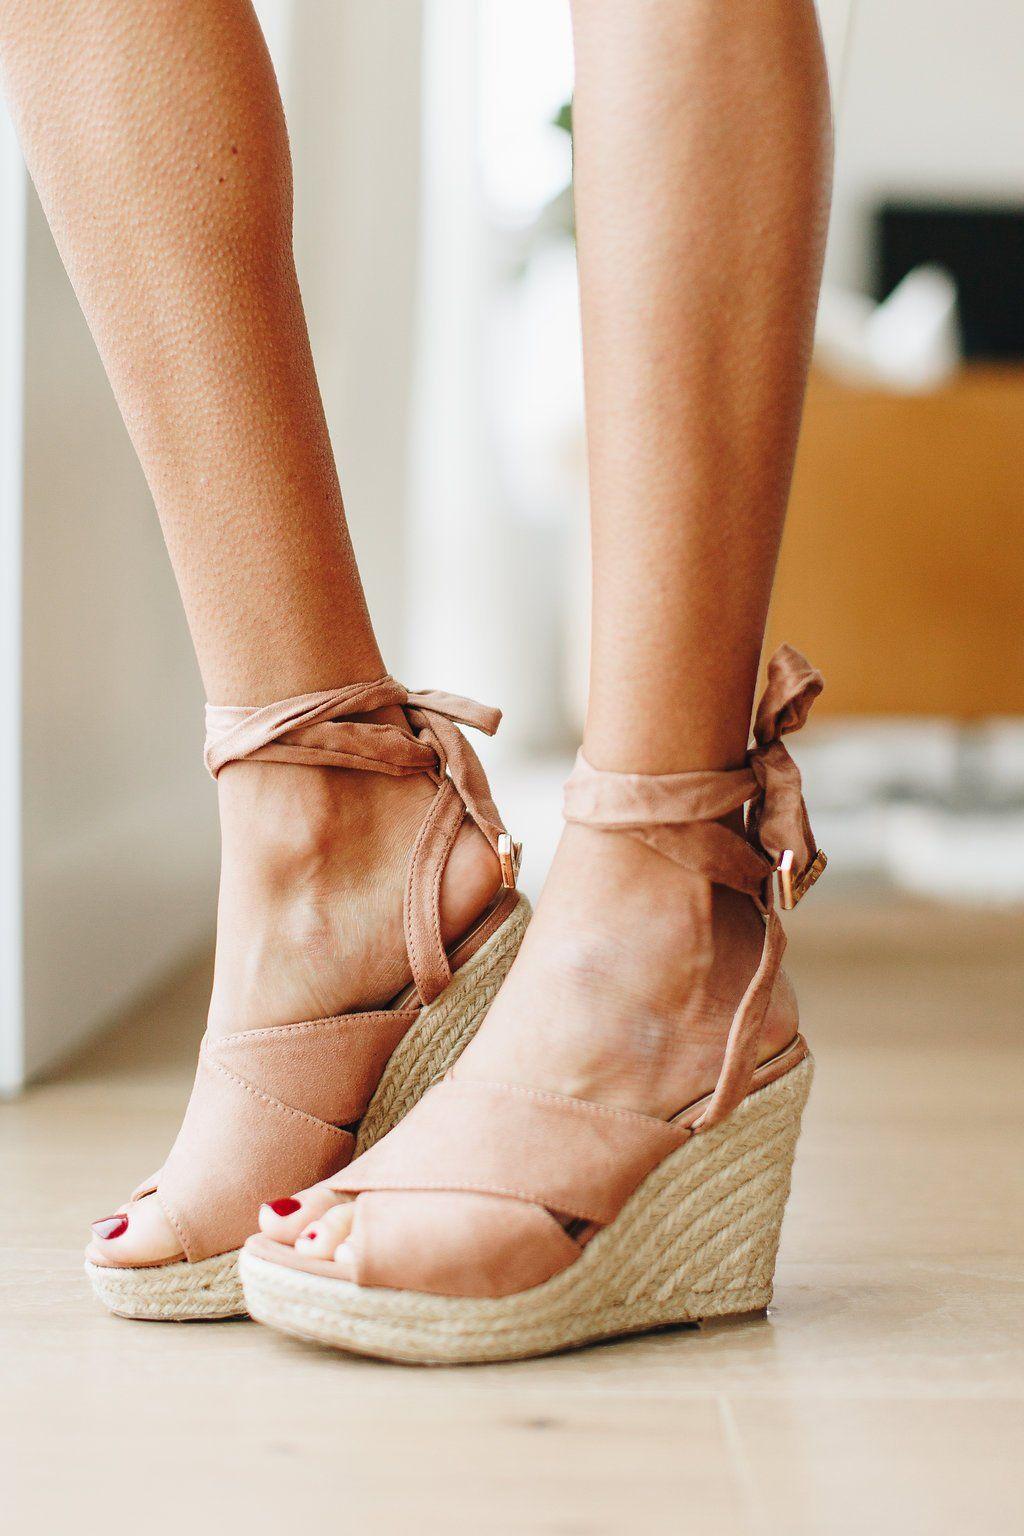 15f41e11e523 St. Thomas Suede Espadrilles Sandals 2018